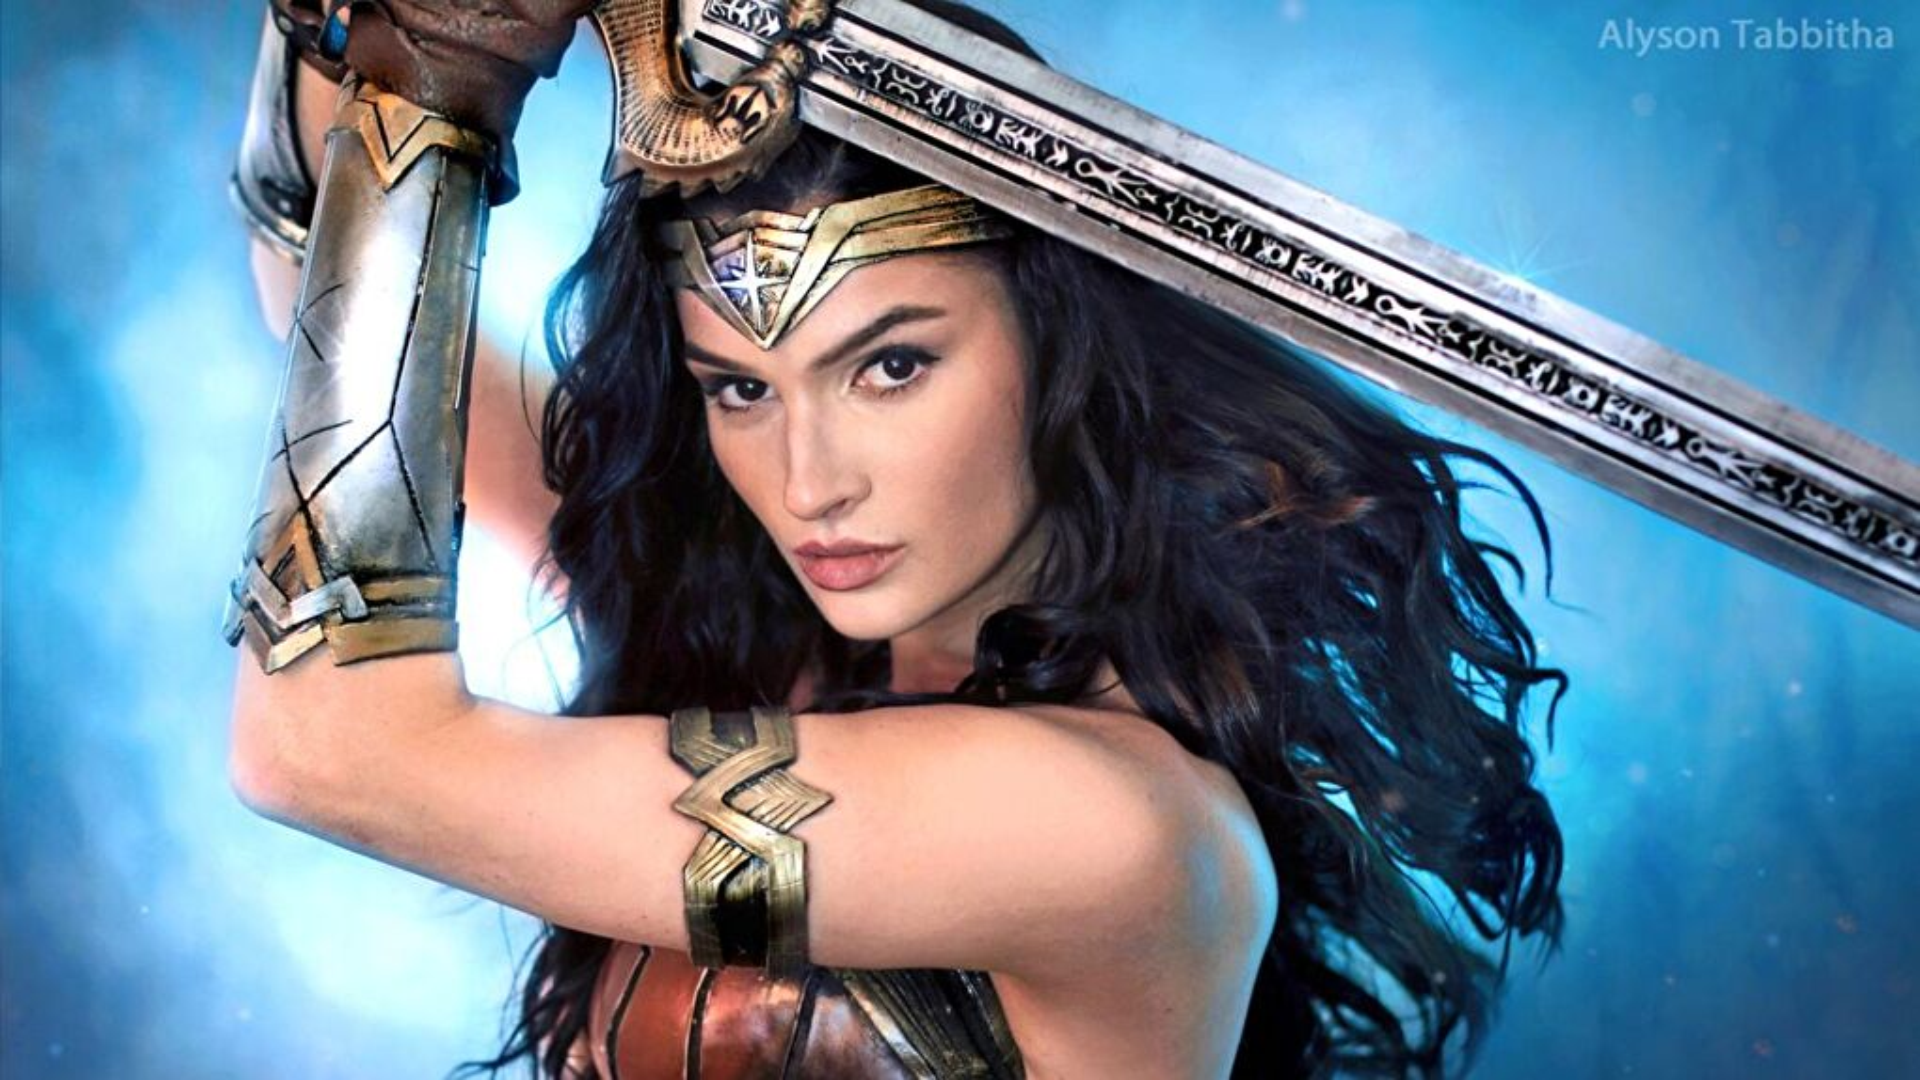 Alyson Tabbitha as Wonder Woman (Self-Portrait)